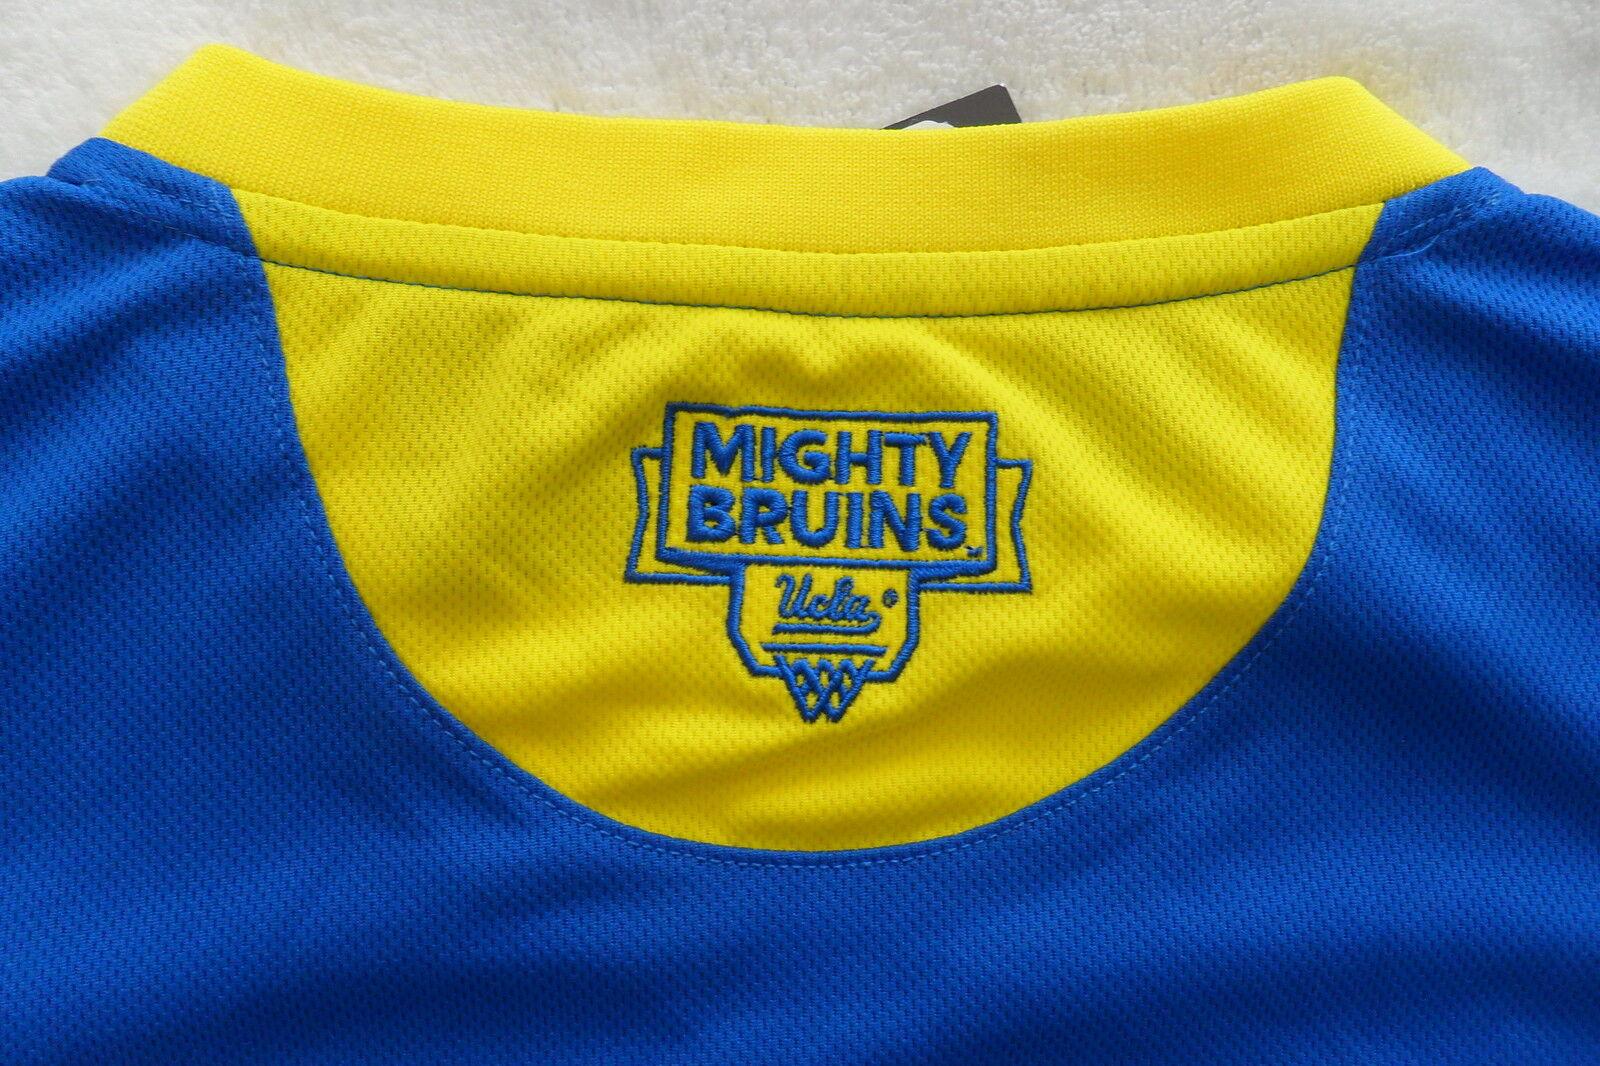 31690b1b98b Nwtadidas UCLA Bruins Premier Basketball Jersey March Madness Shirt Topmen  2xl for sale online